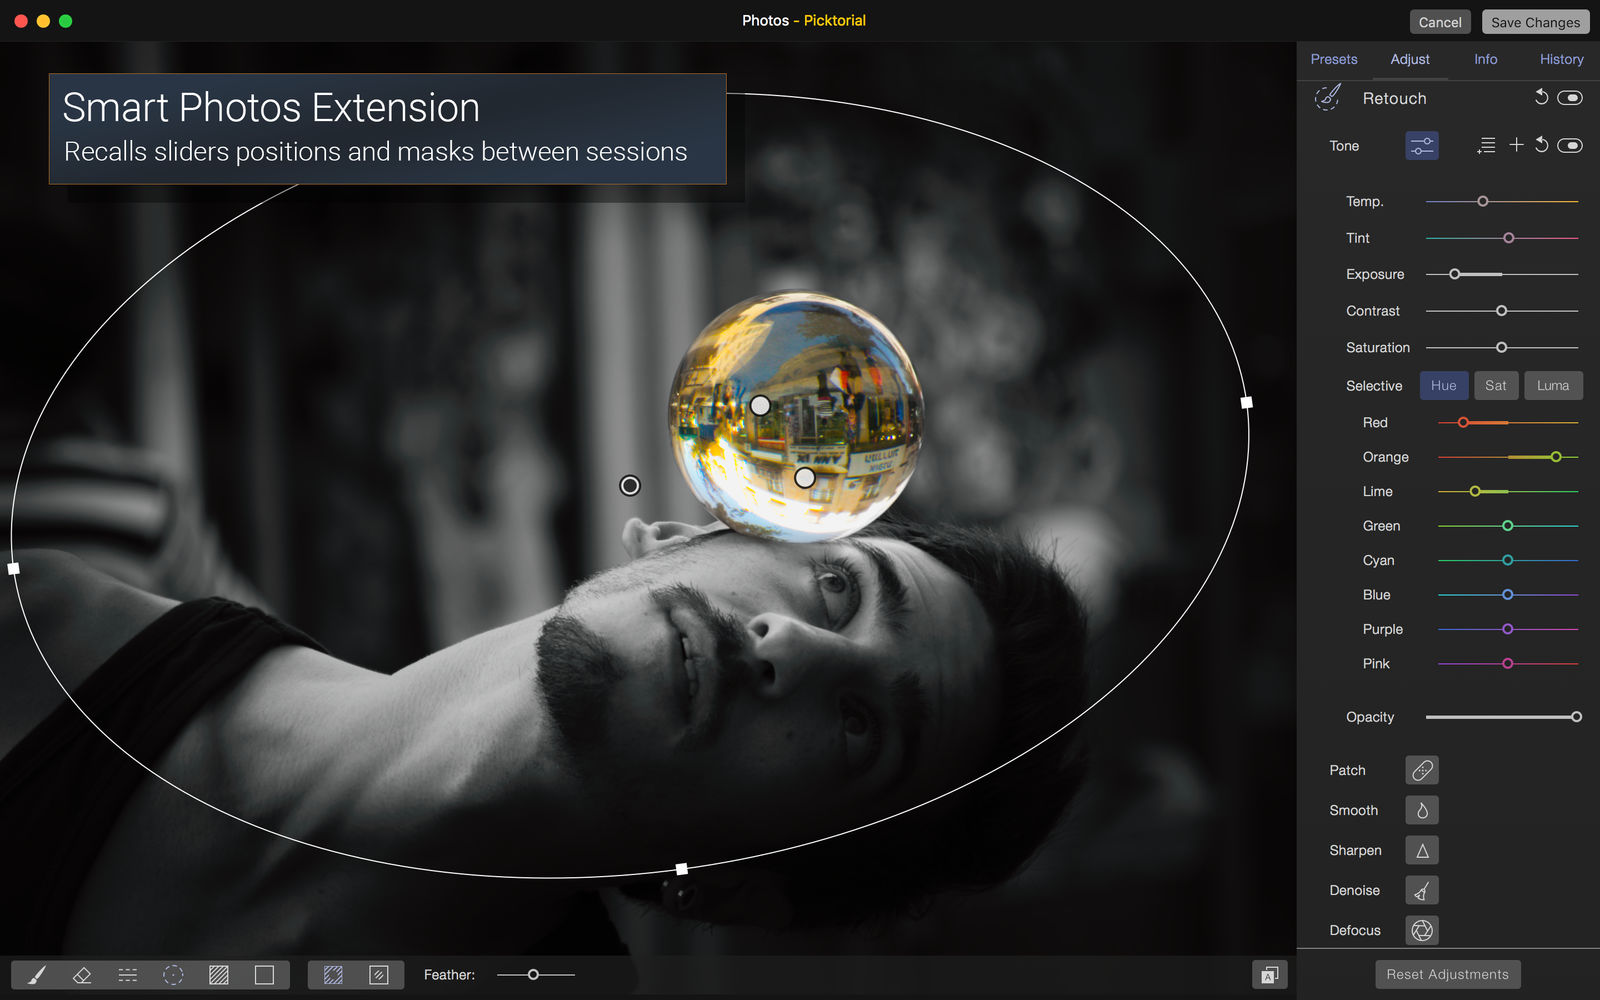 Picktorial 3.0.6.384专业直观的照片编辑器